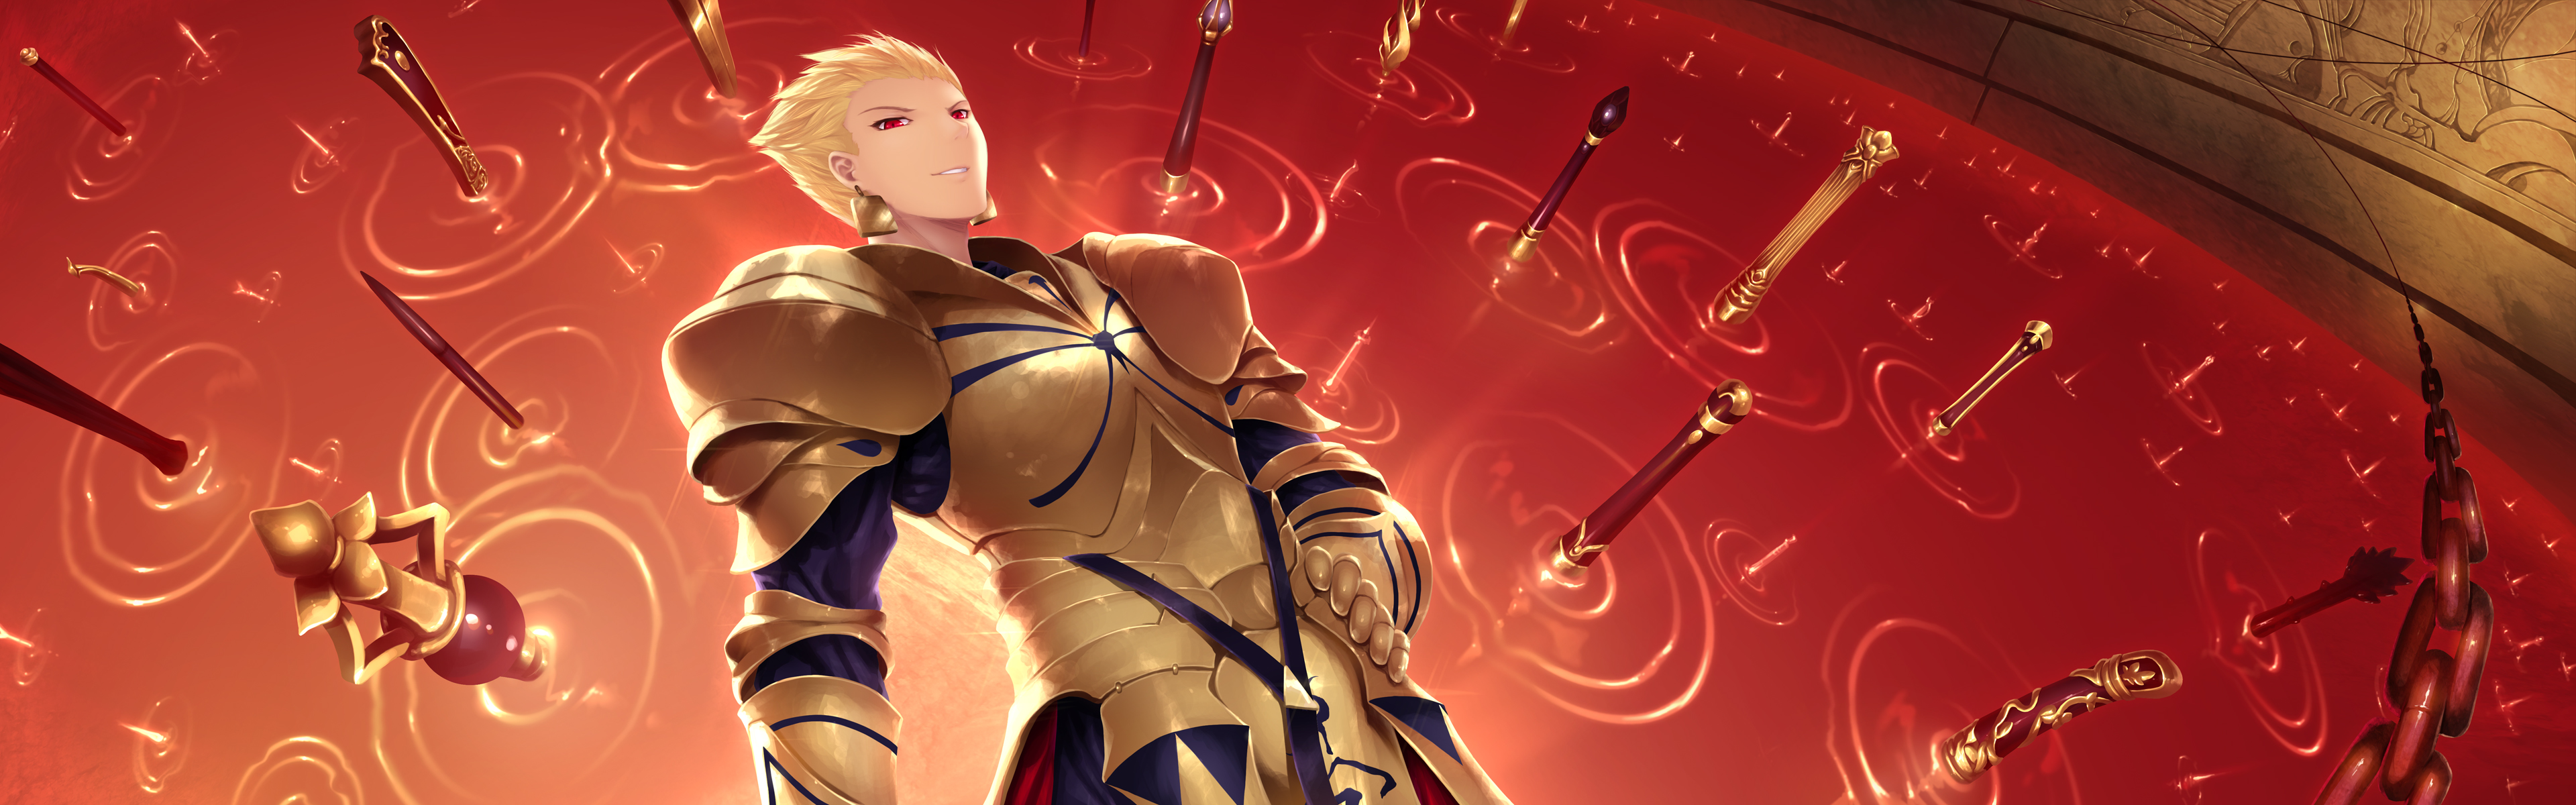 Gilgamesh Fate Stay Night Image 1112752 Zerochan Anime